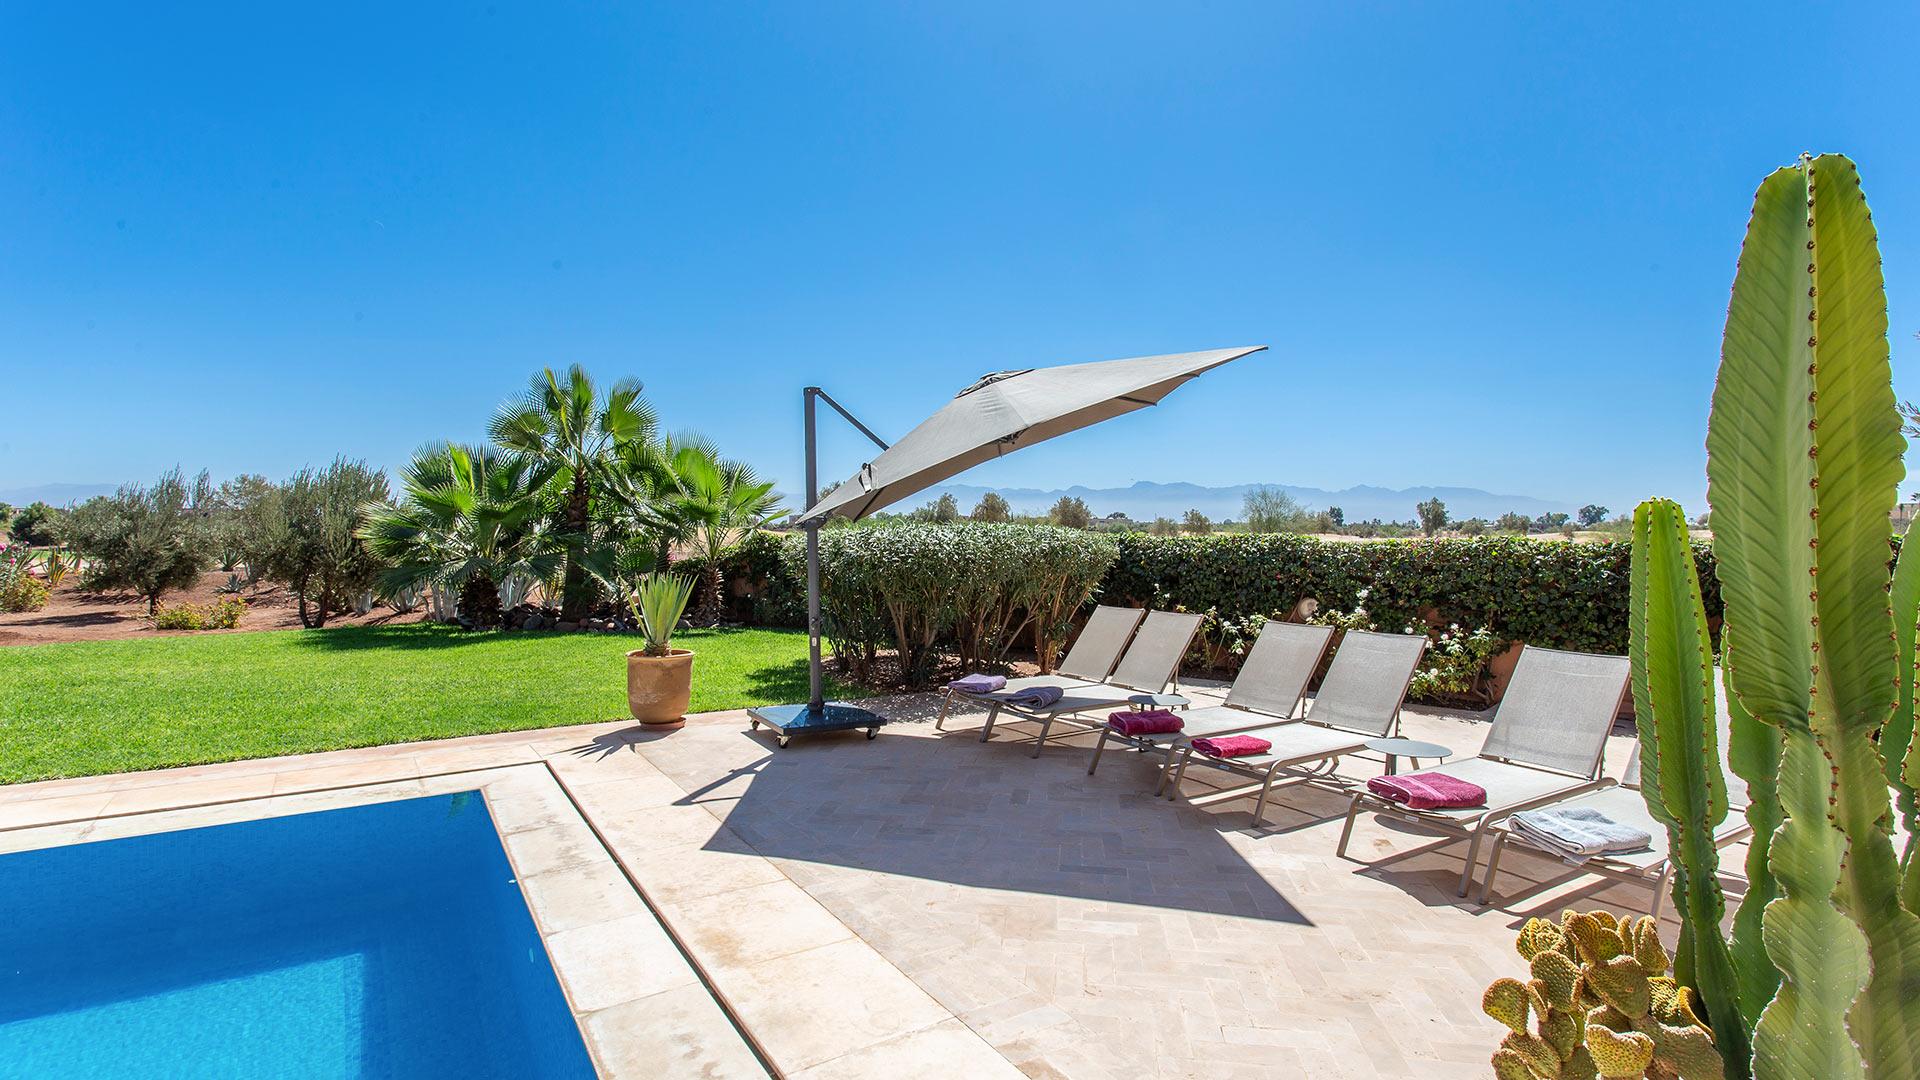 Villa Villa Duly, Rental in Marrakech